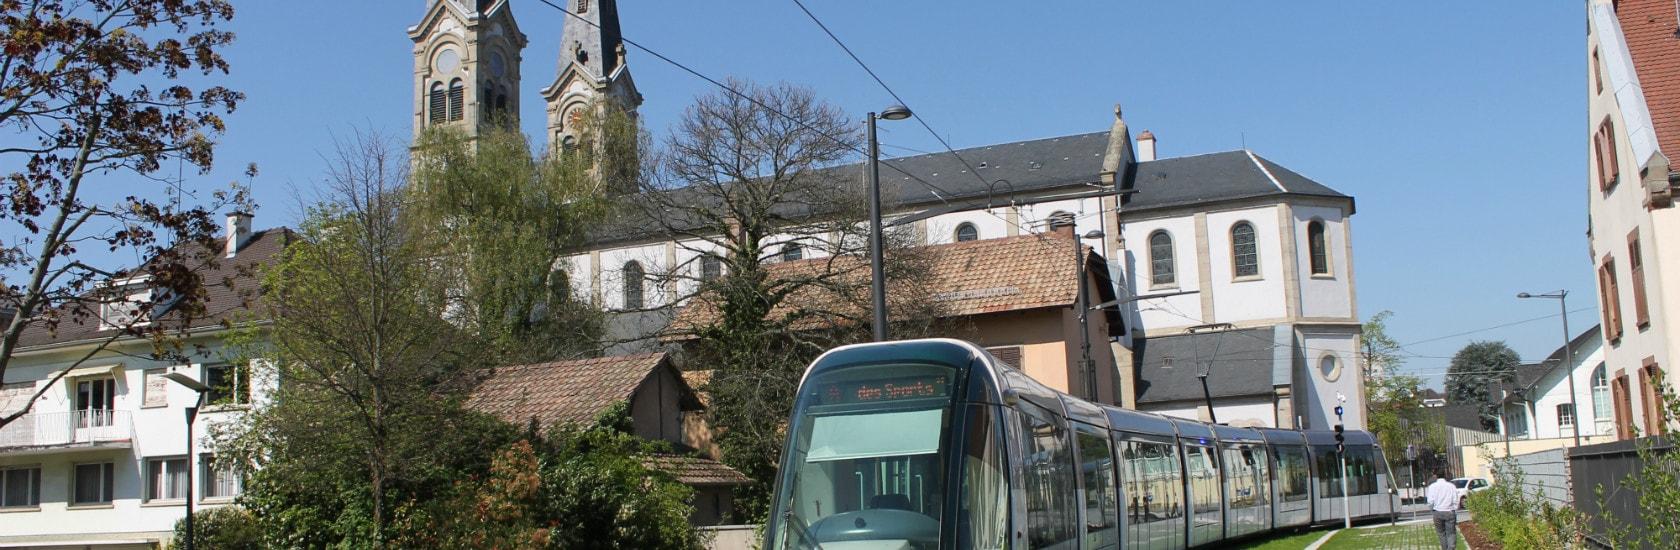 Le centre d'Illkirch-Graffenstaden raccordé au tram samedi